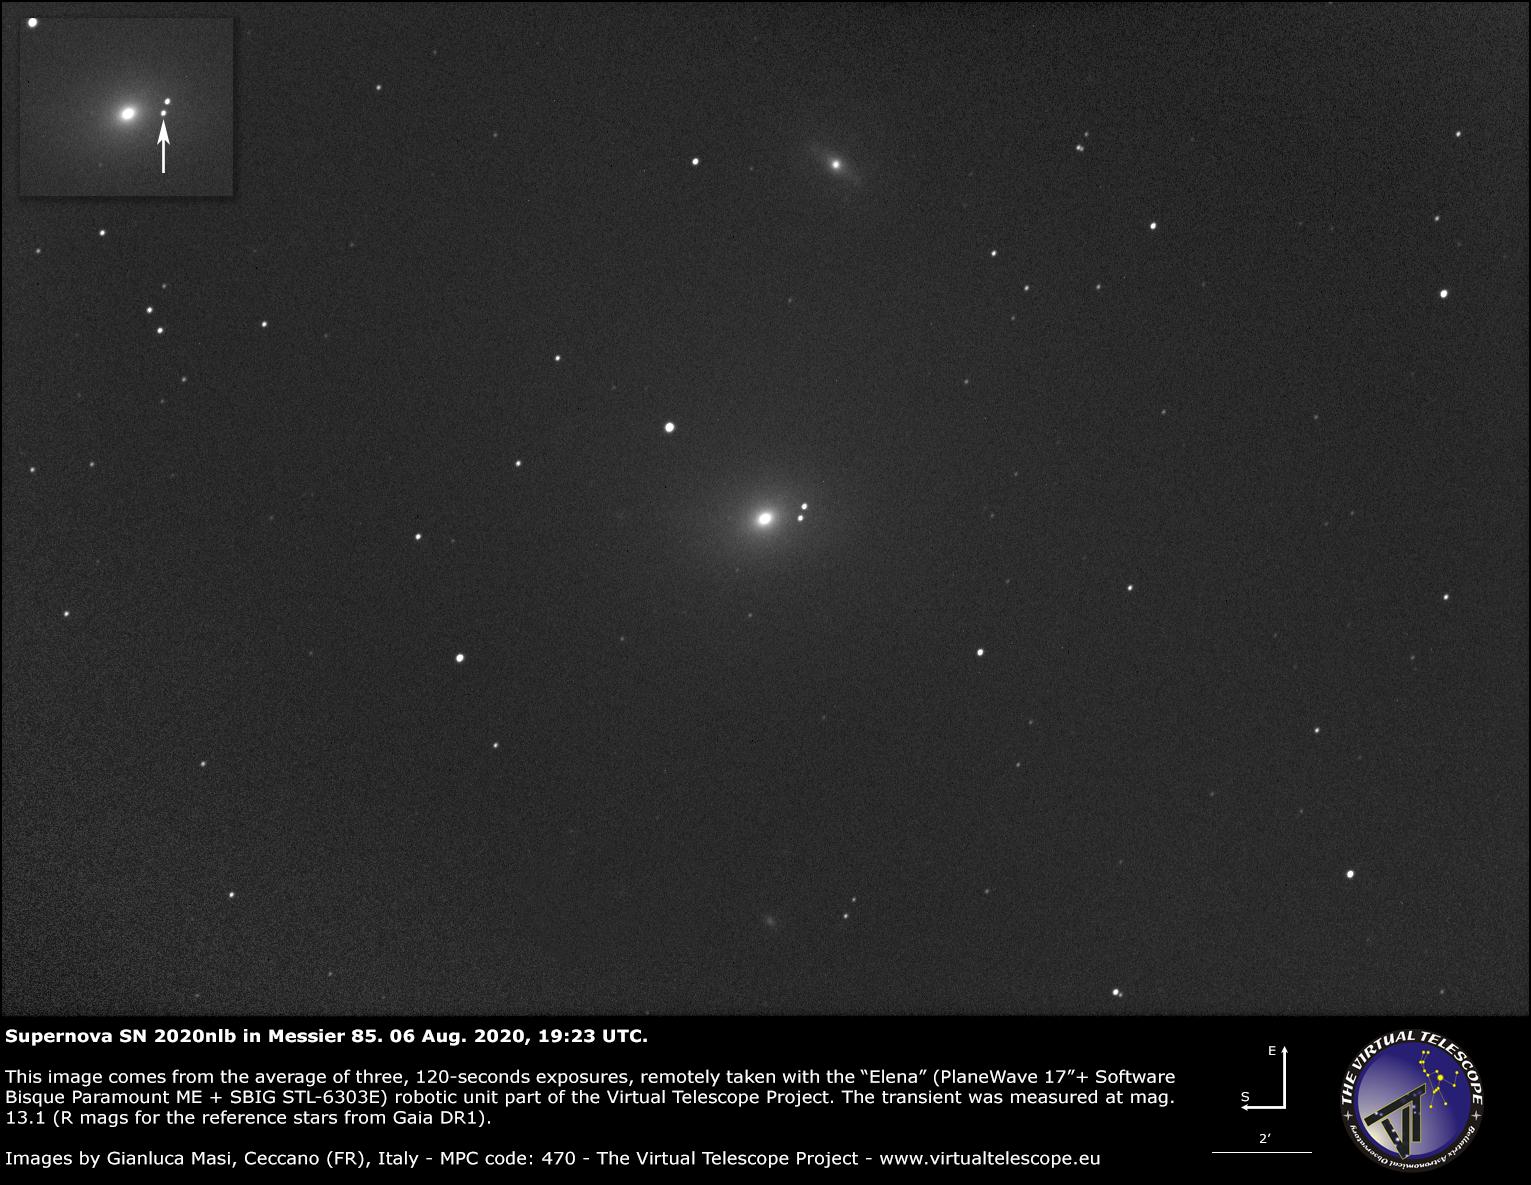 Supernova SN 2020nlb in Messier 85: an image - 06 Aug. 2020.